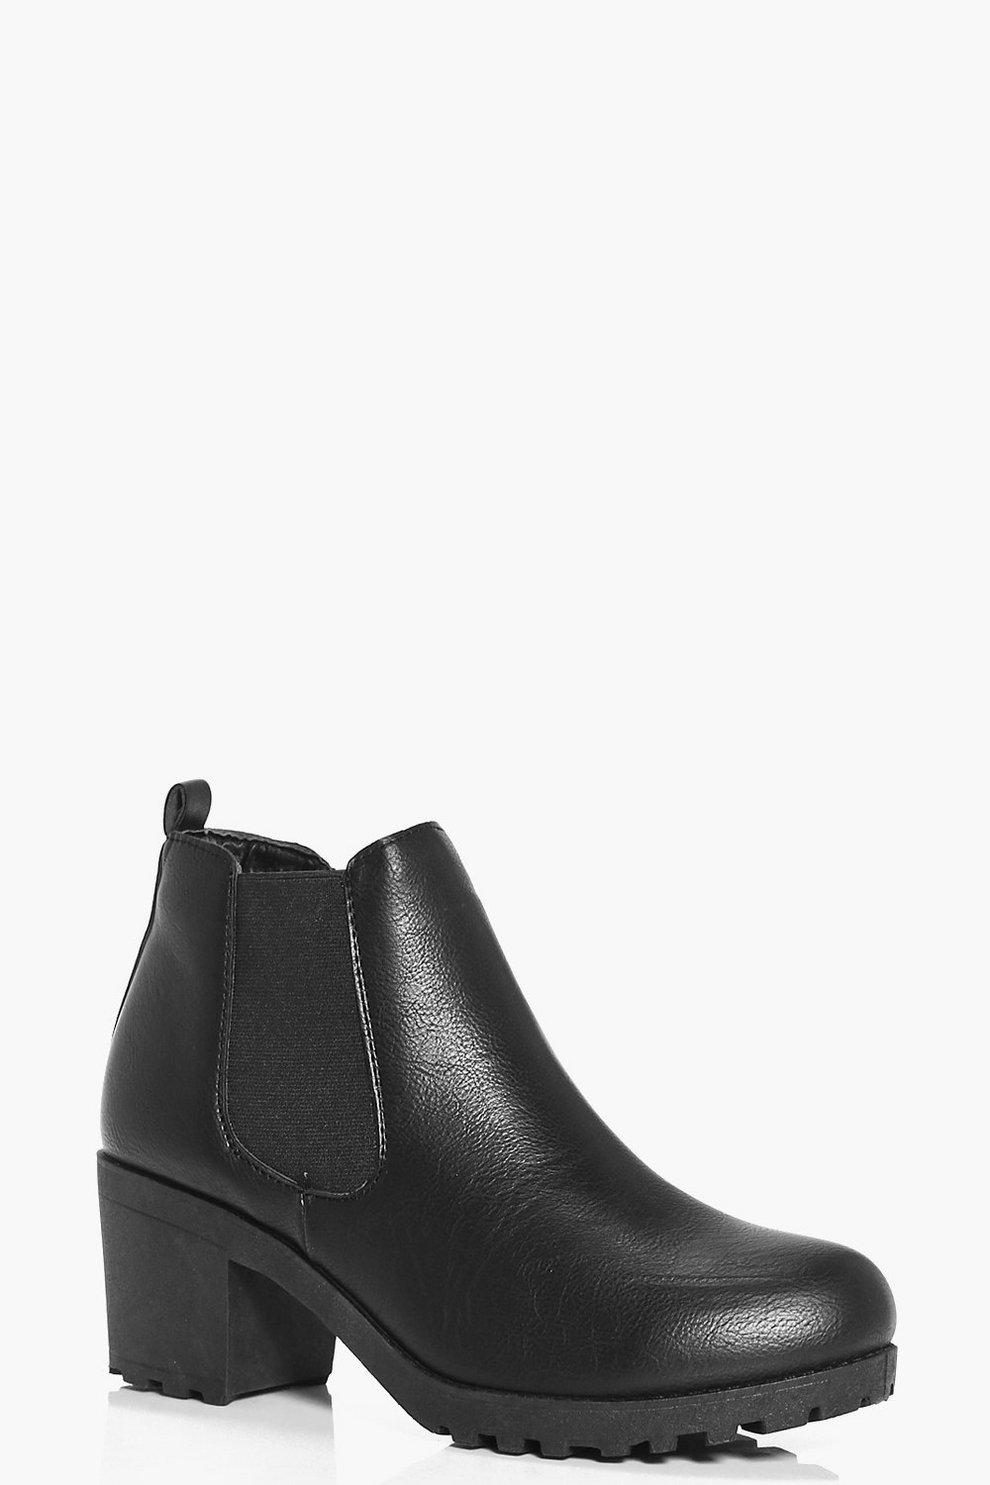 7c00957b1b2 Lois Chunky Cleated Heel Chelsea Boot